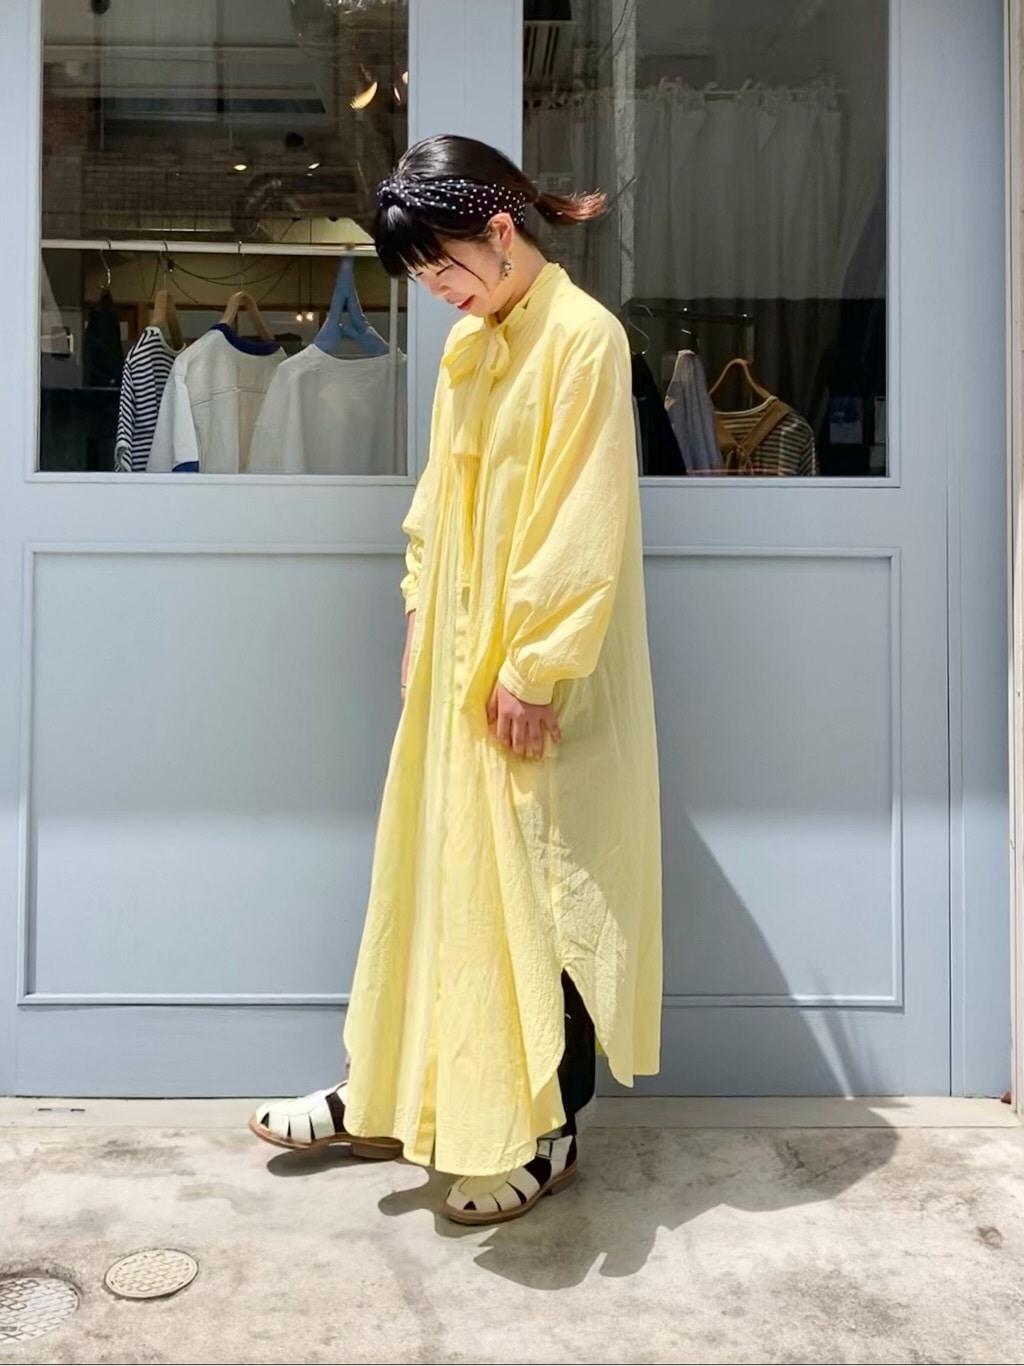 l'atelier du savon 新宿ミロード 身長:153cm 2021.05.11